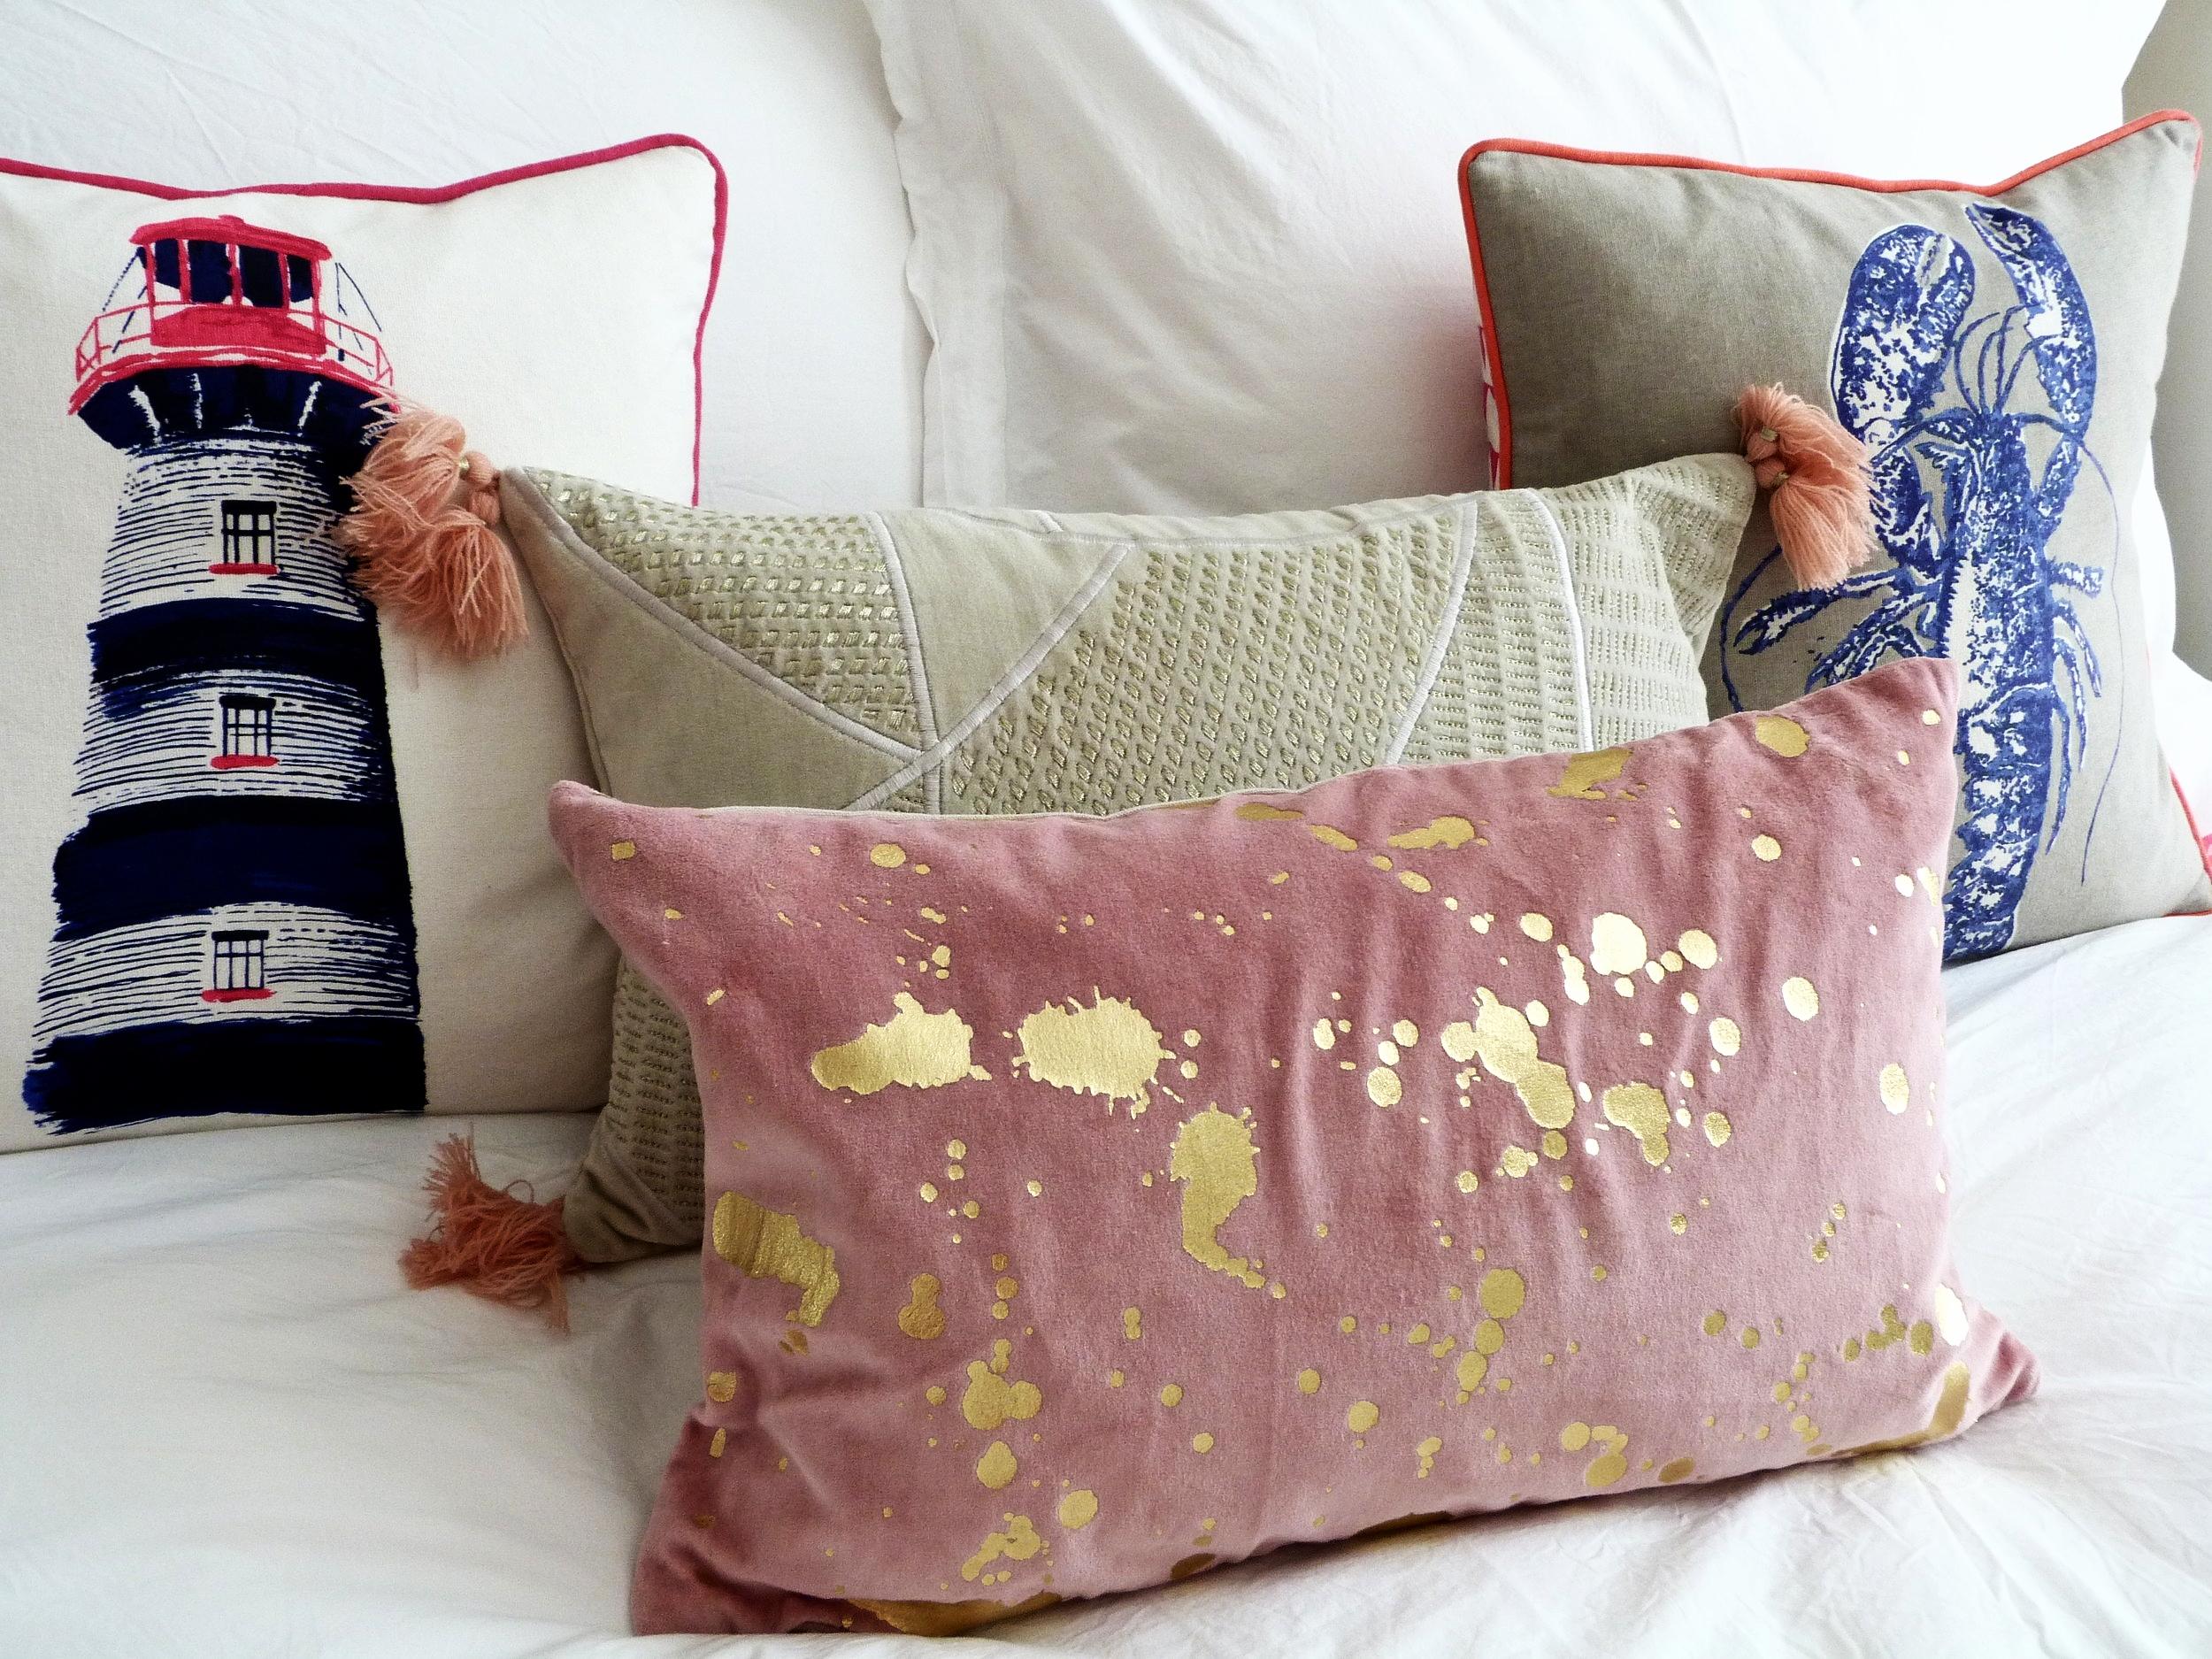 Oliver Bonas & Joules Cushions